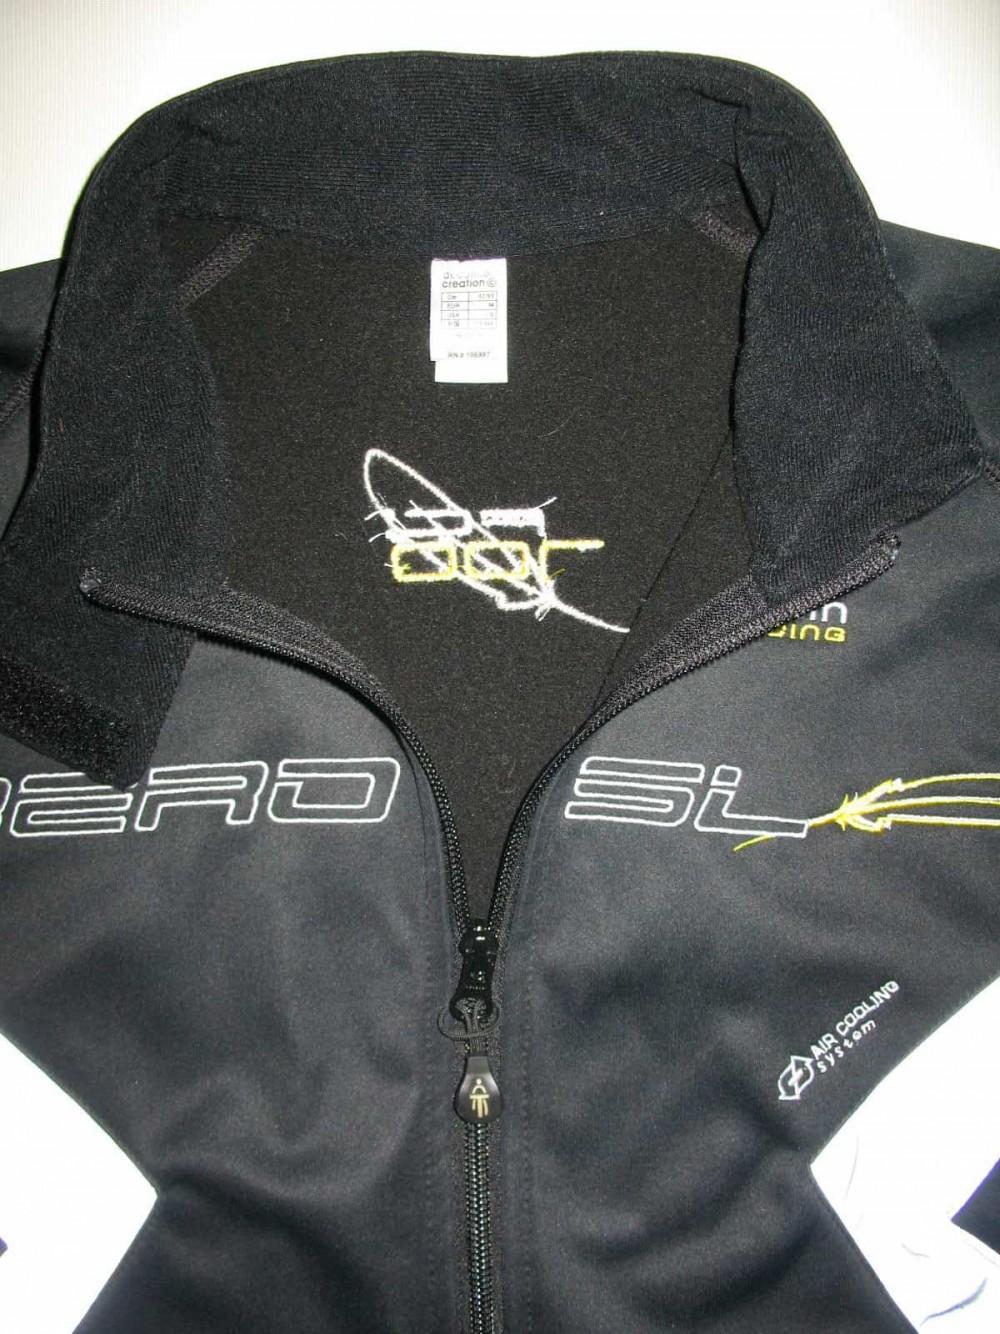 Велокуртка BTWIN aero sl cycling jacket (размер М) - 4